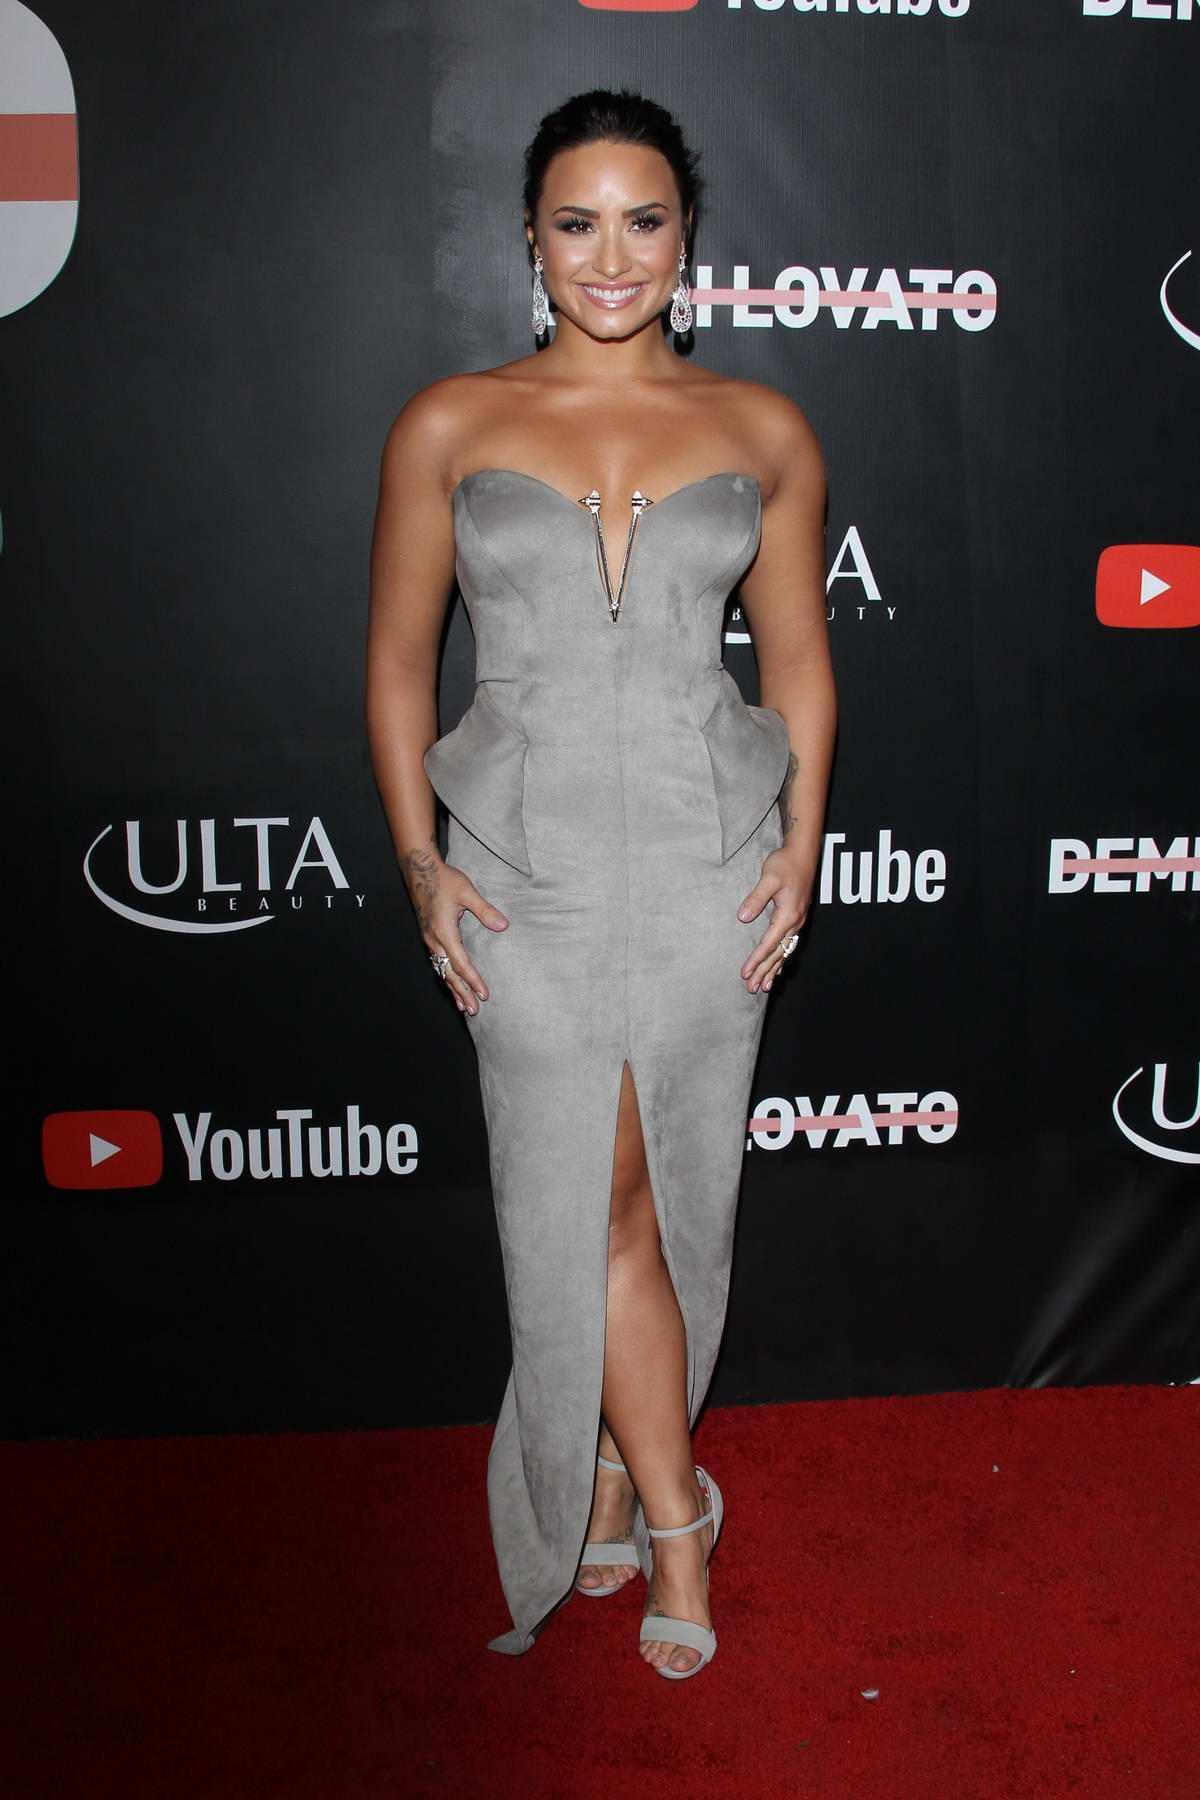 Demi Lovato at Youtube premiere of Demi Lovato: Simply Complicated in Los Angeles